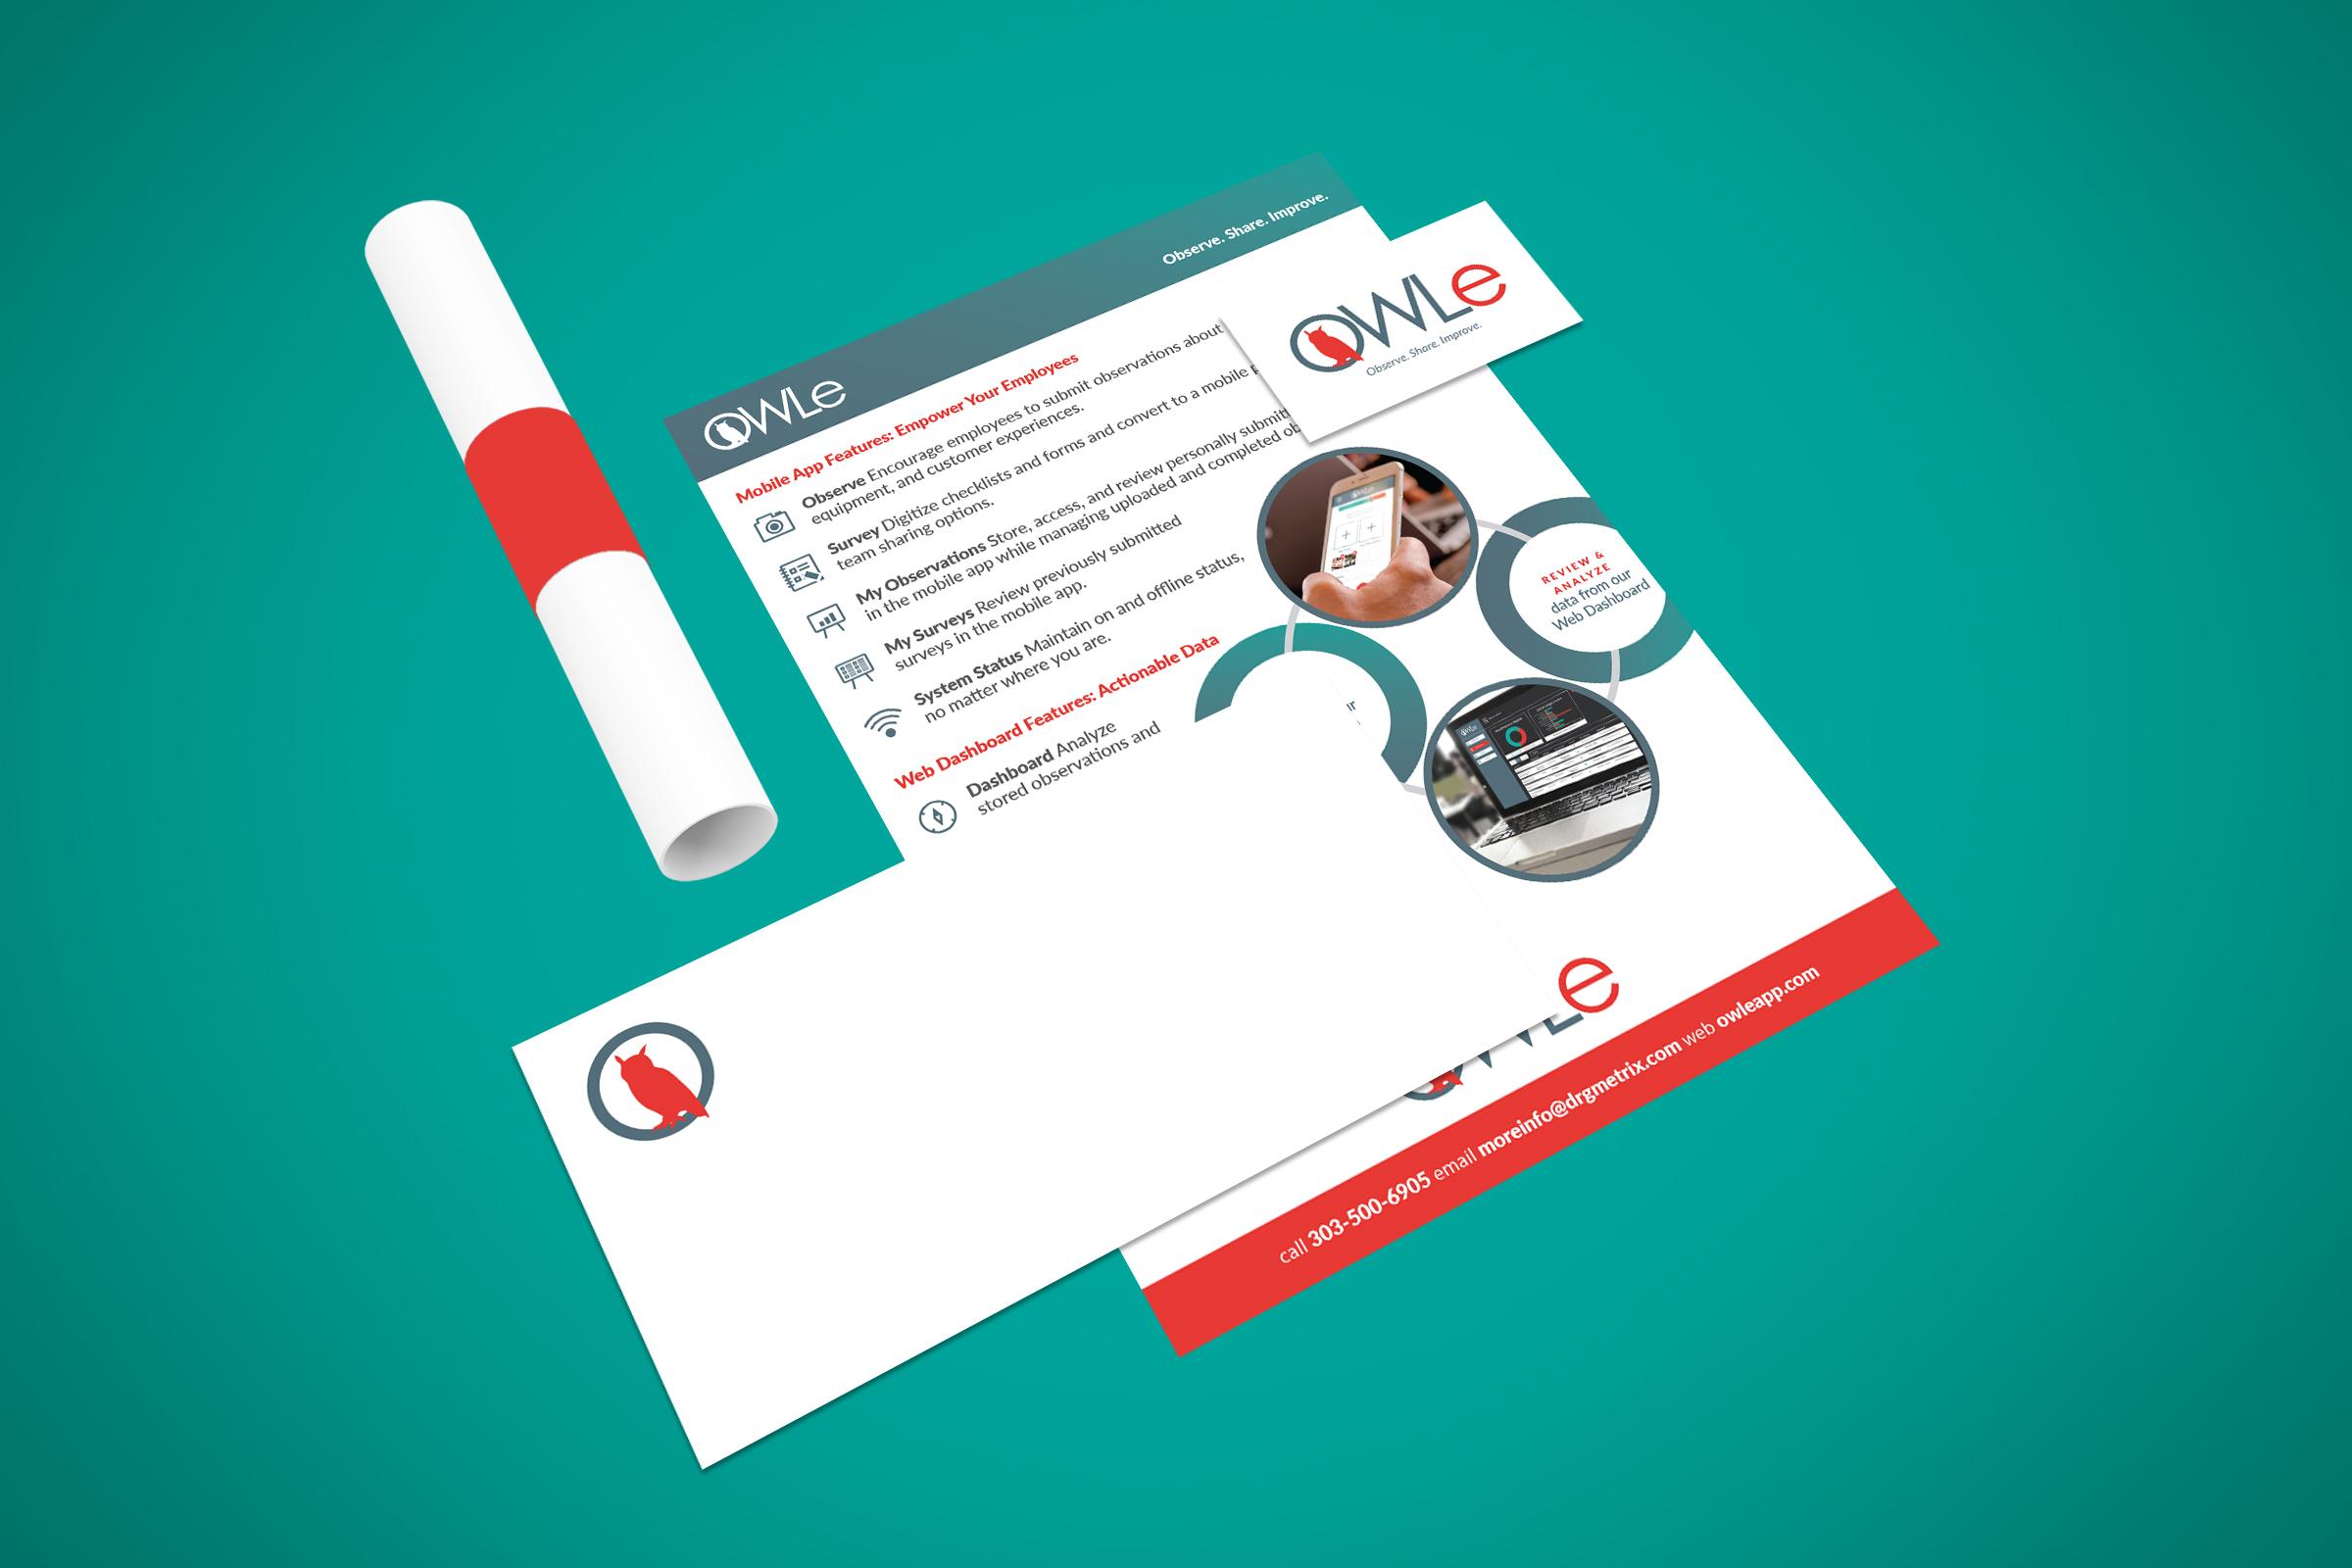 hearthfire-creative-marketing-collateral-brand-identity-designer-denver-colorado-owle-3.jpg